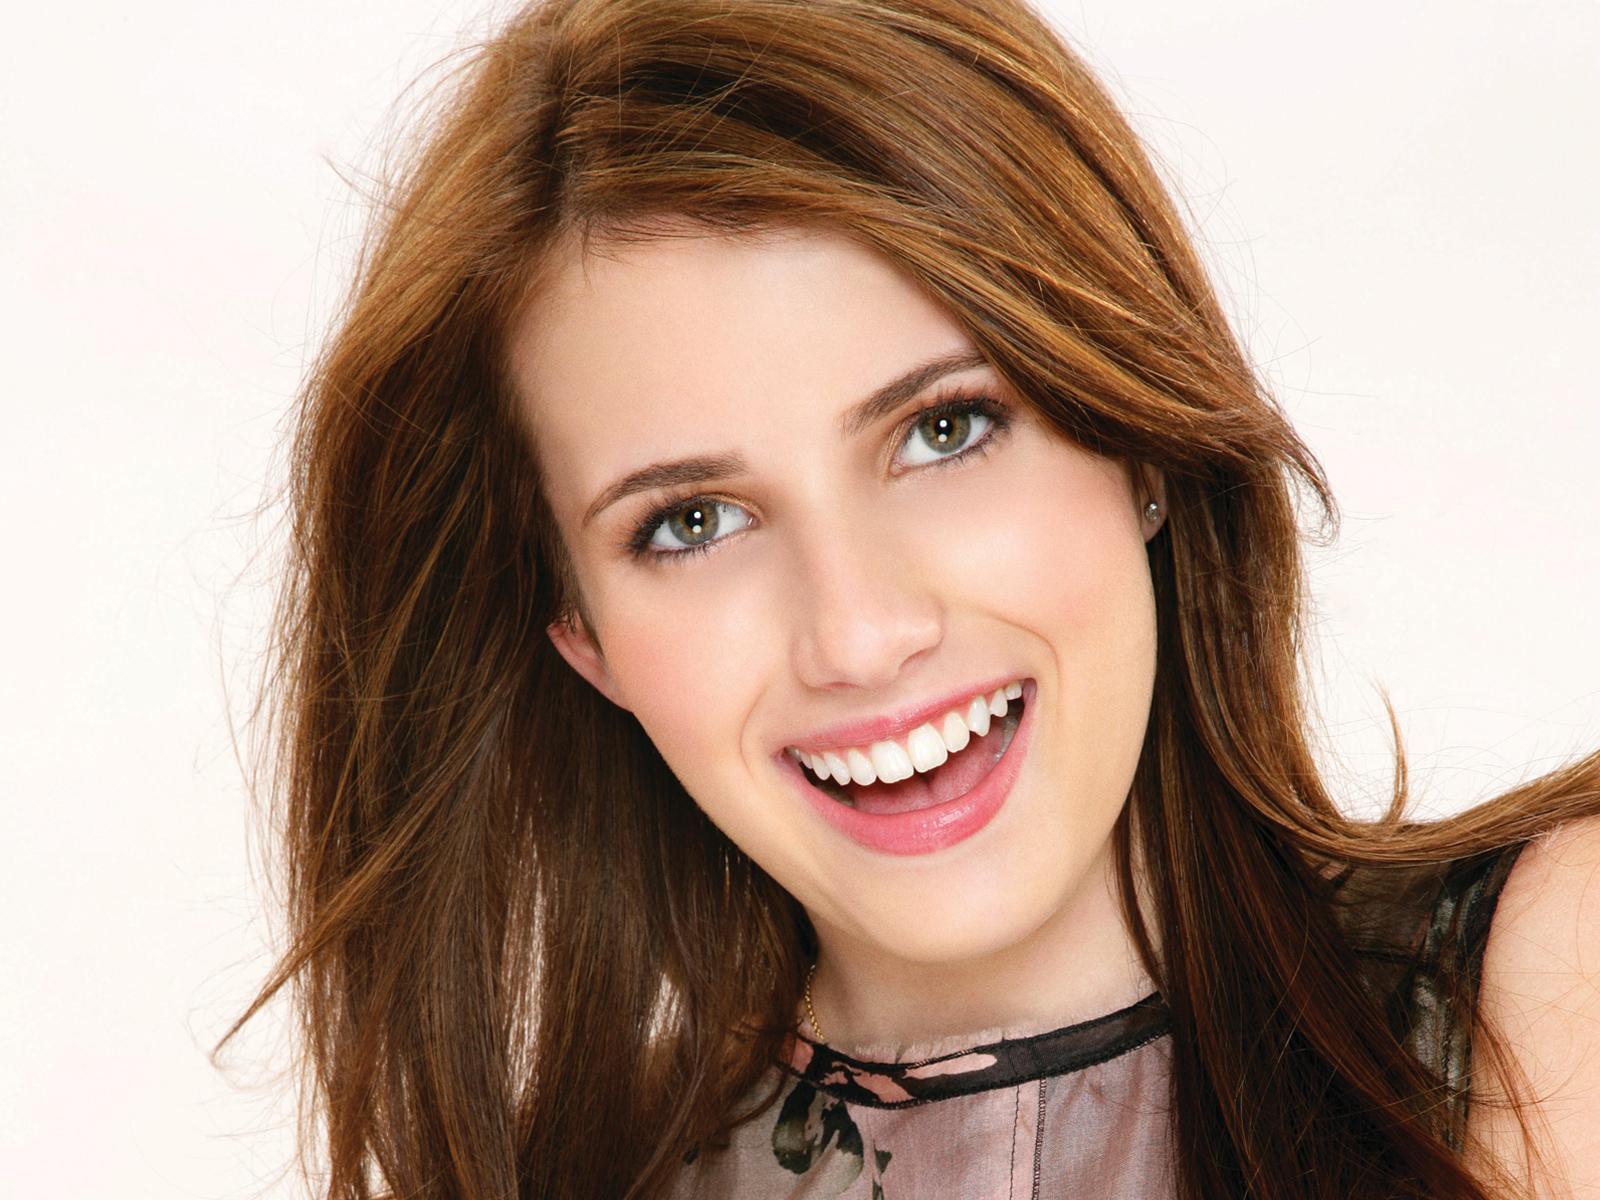 emma-roberts-cute-smile